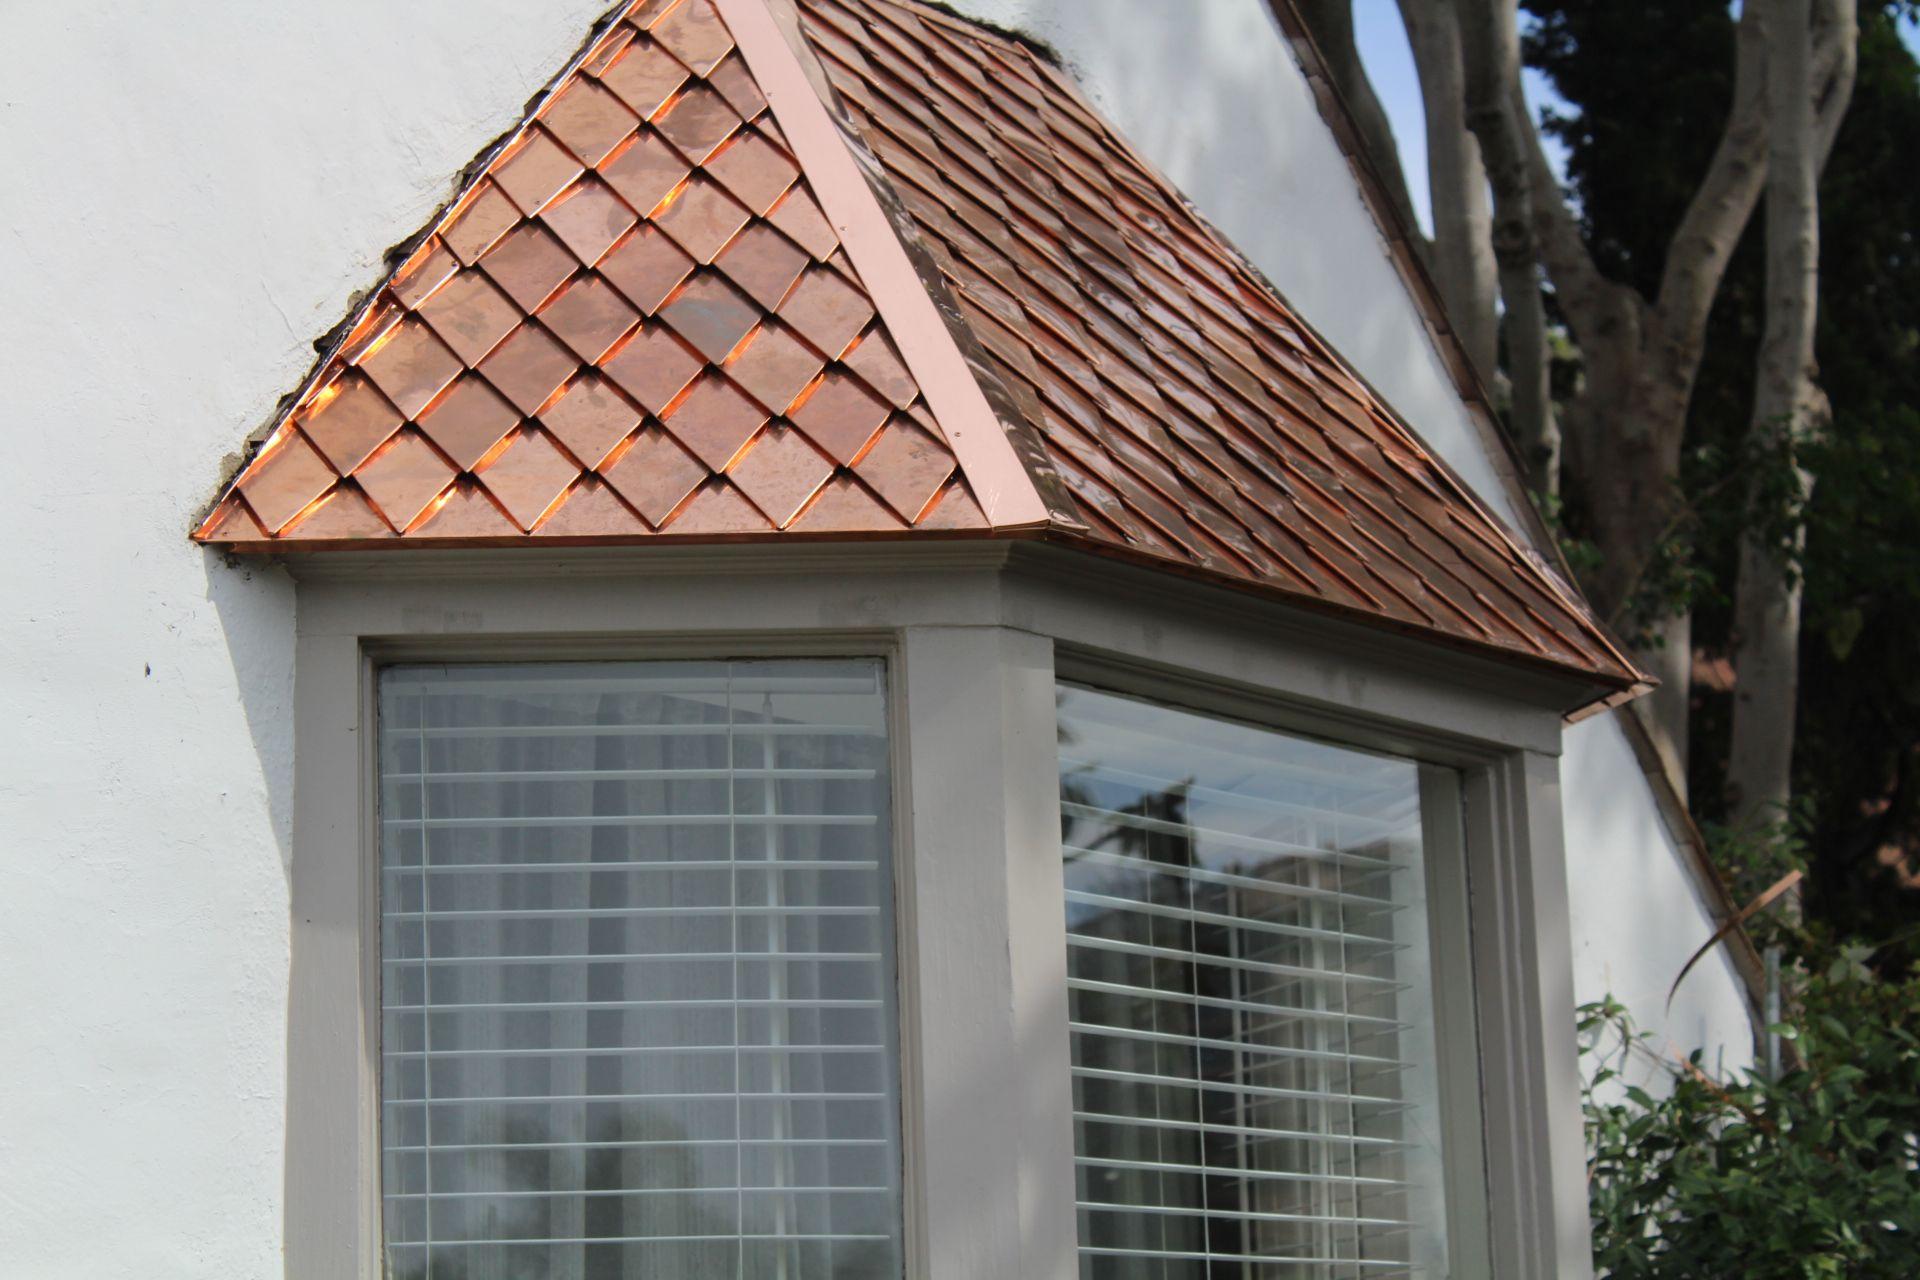 Diamond Shingle Bay Window Roof Copper Roof House Metal Roof Houses Metal Roof